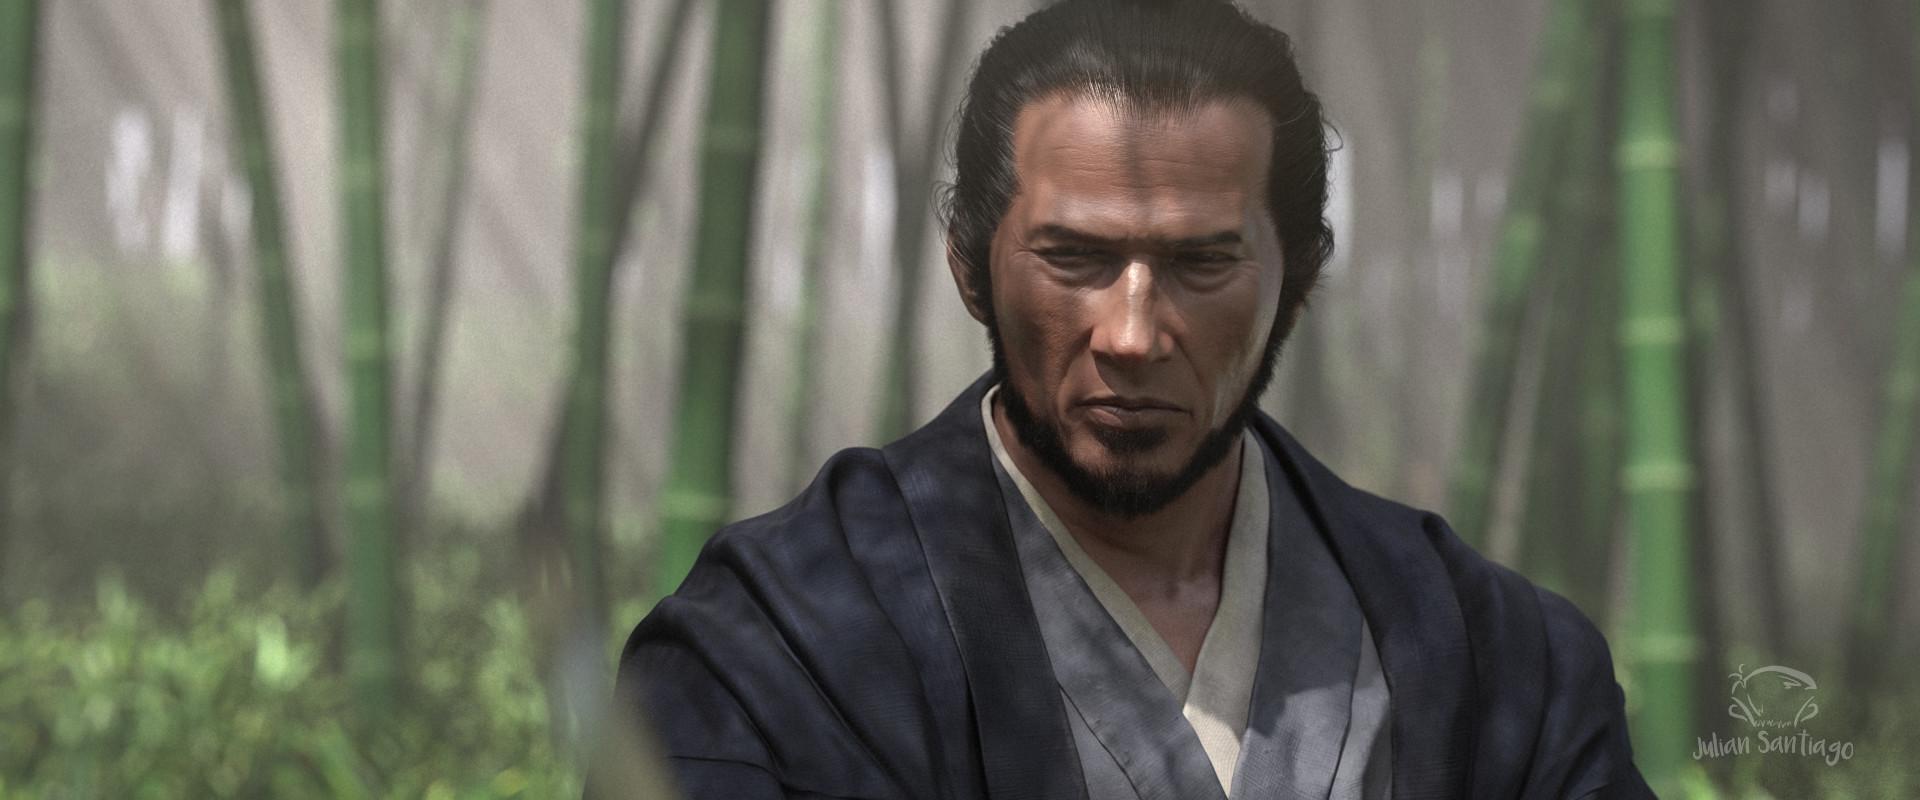 Julian santiago juliansantiago samurai daystill